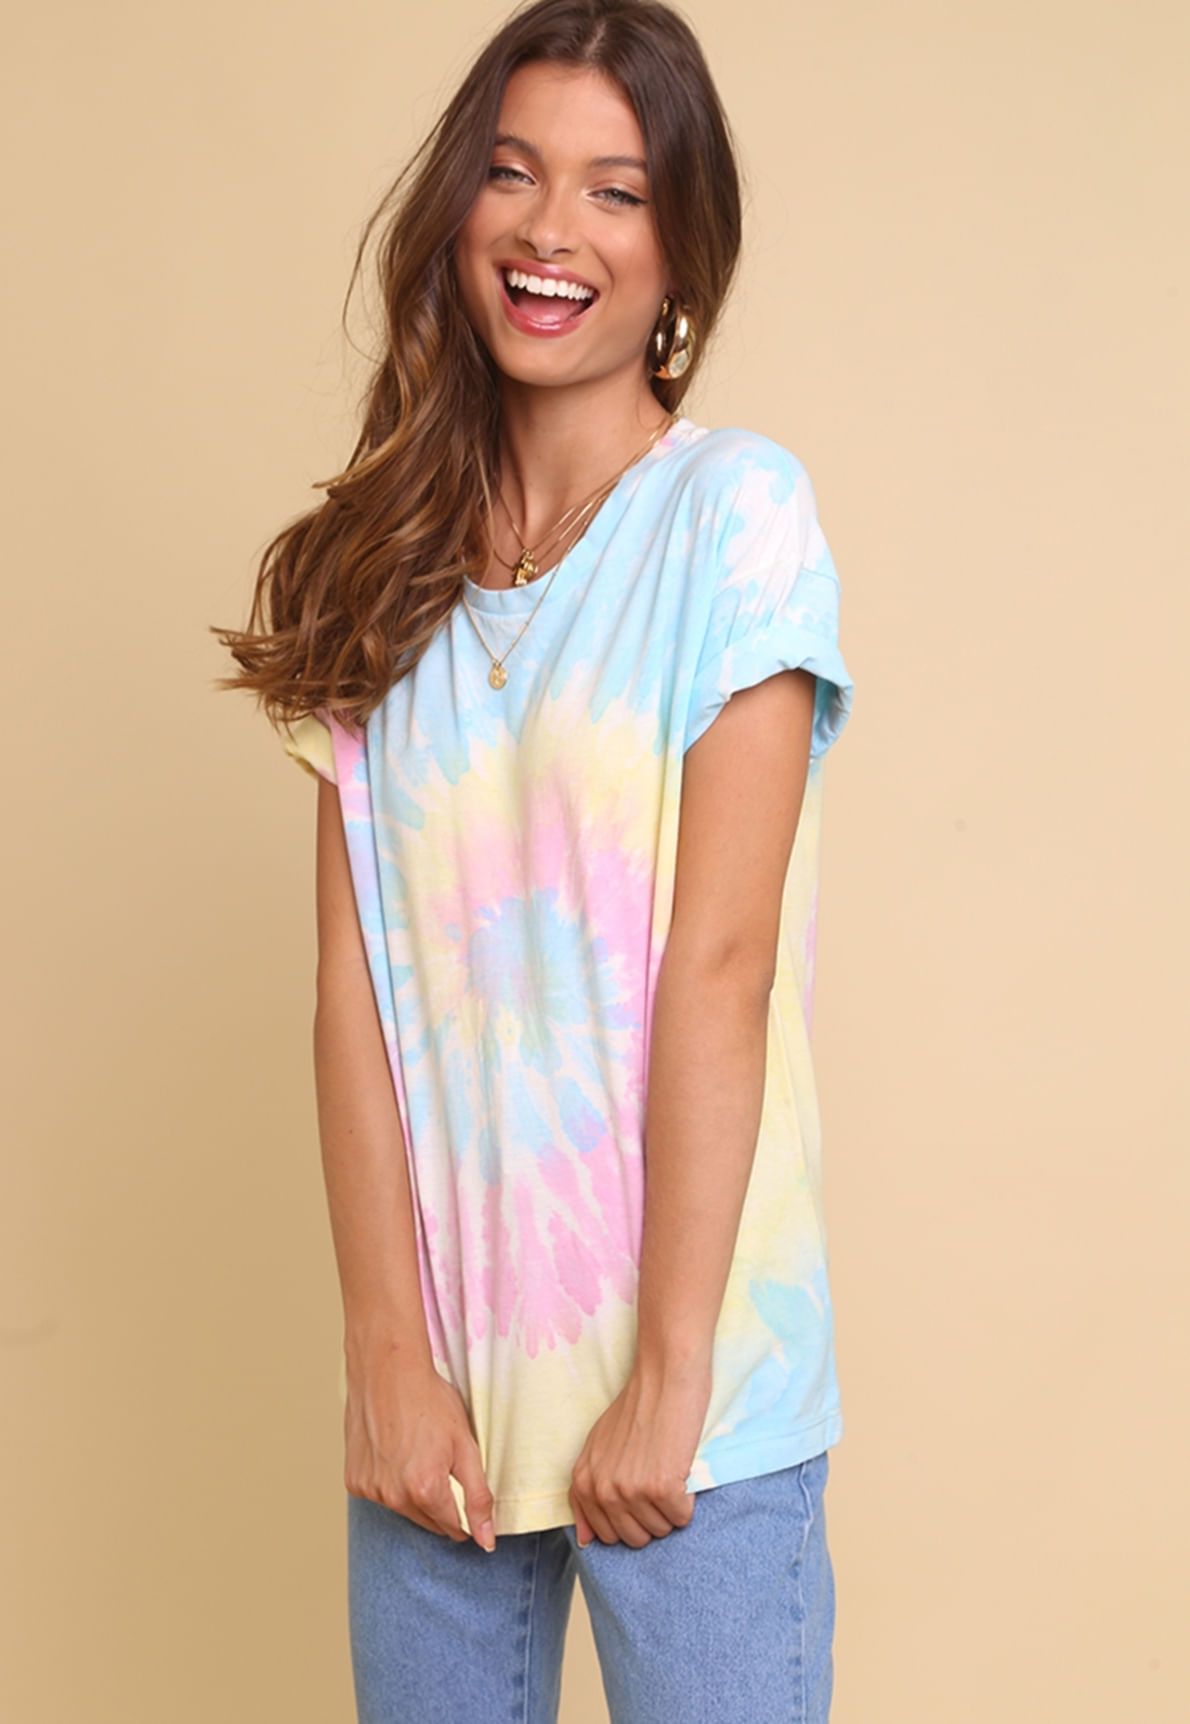 30141-t-shirt-tie-dye-candy-daydream-mundo-lolita-02